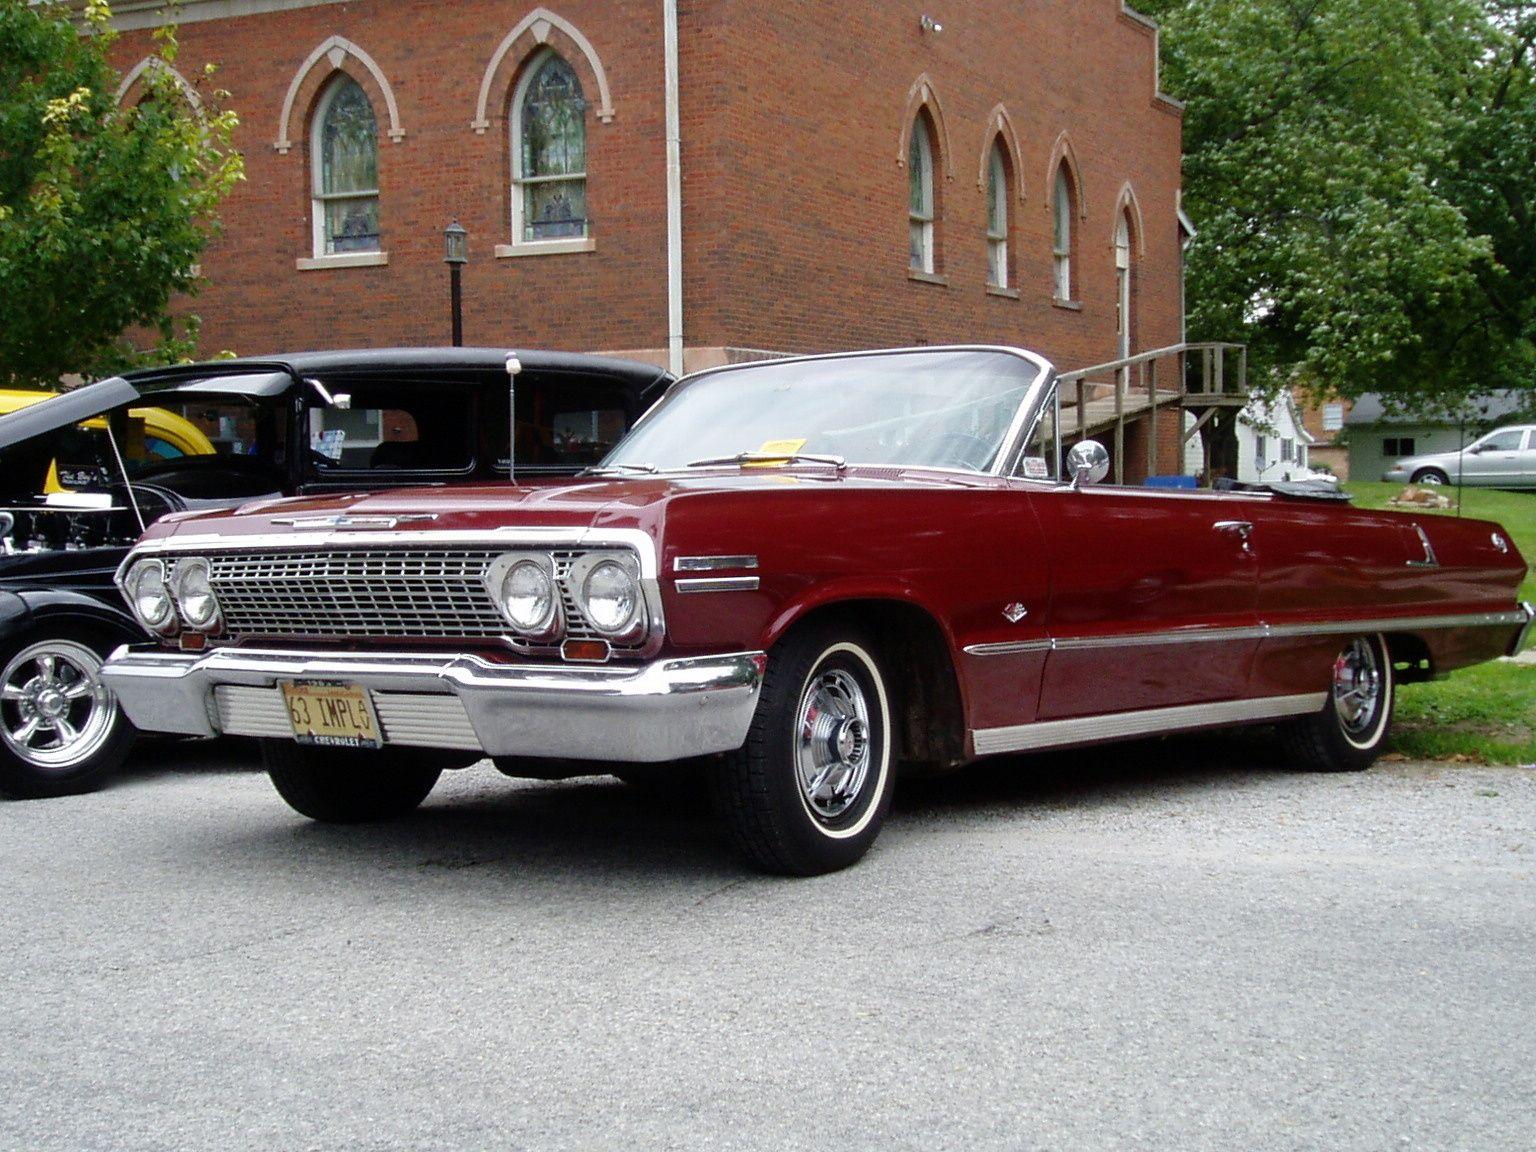 1963 Chevrolet Impala Pictures Cargurus Chevrolet Impala Chevrolet Chevy Impala